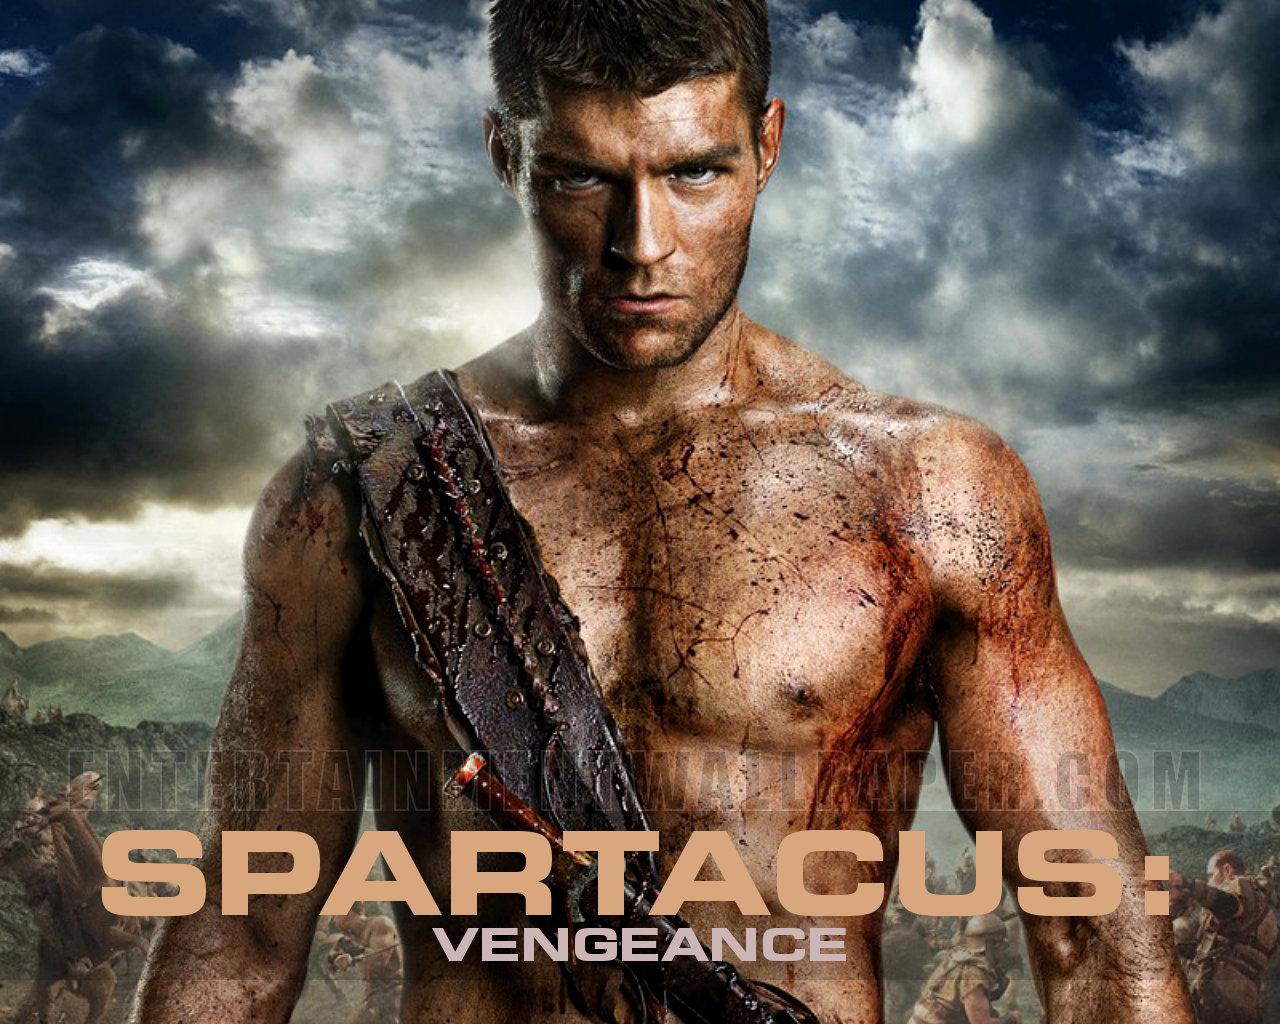 Spartacus-spartacus-blood-and-sand-30383189-1280-1024